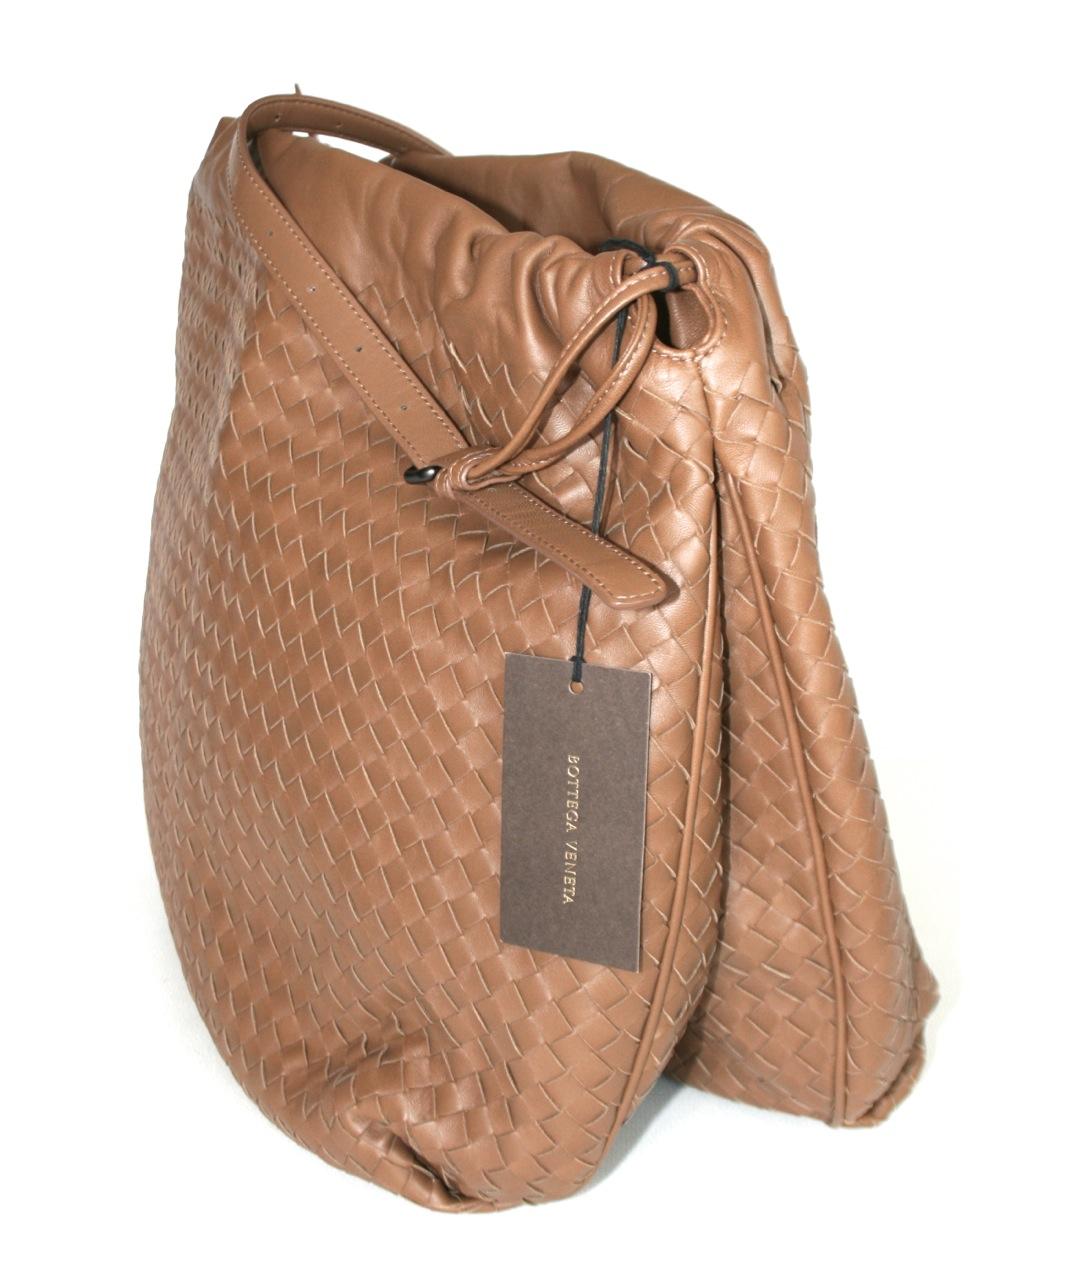 luxus bottega veneta schulter tasche handtasche v0016 caramell neu ebay. Black Bedroom Furniture Sets. Home Design Ideas